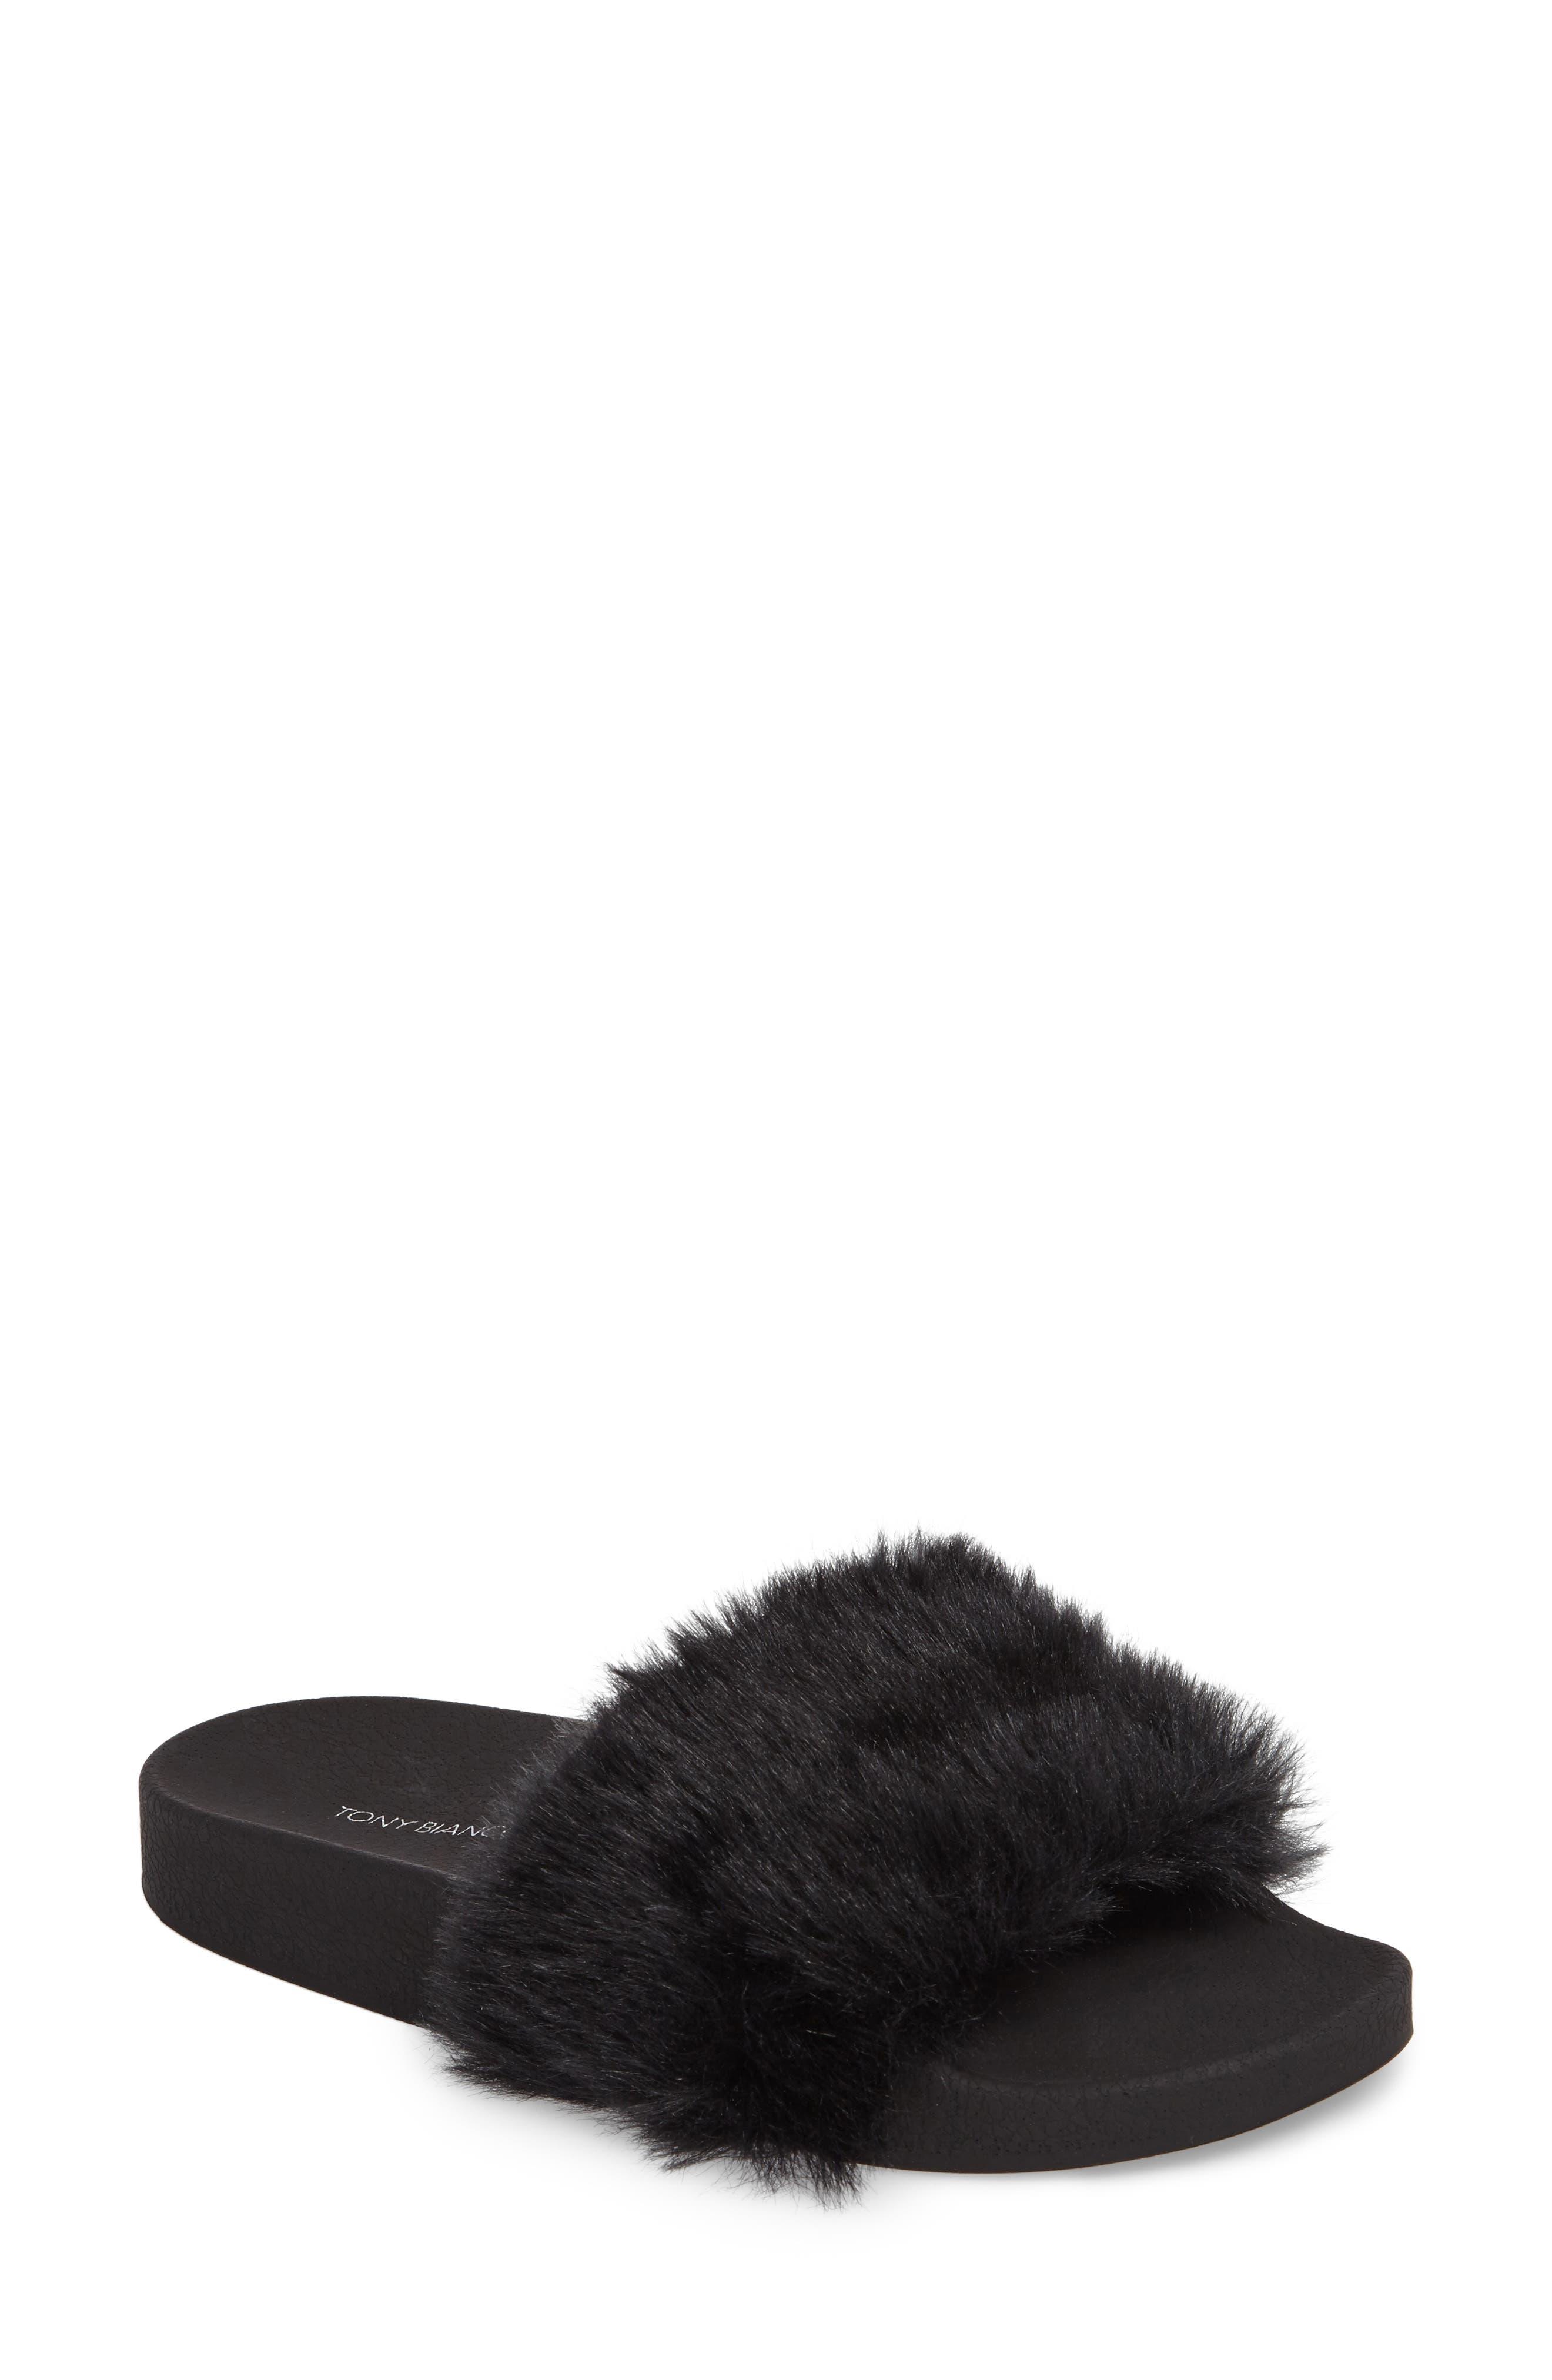 Alternate Image 1 Selected - Tony Bianco Vixen Slide Sandal (Women)